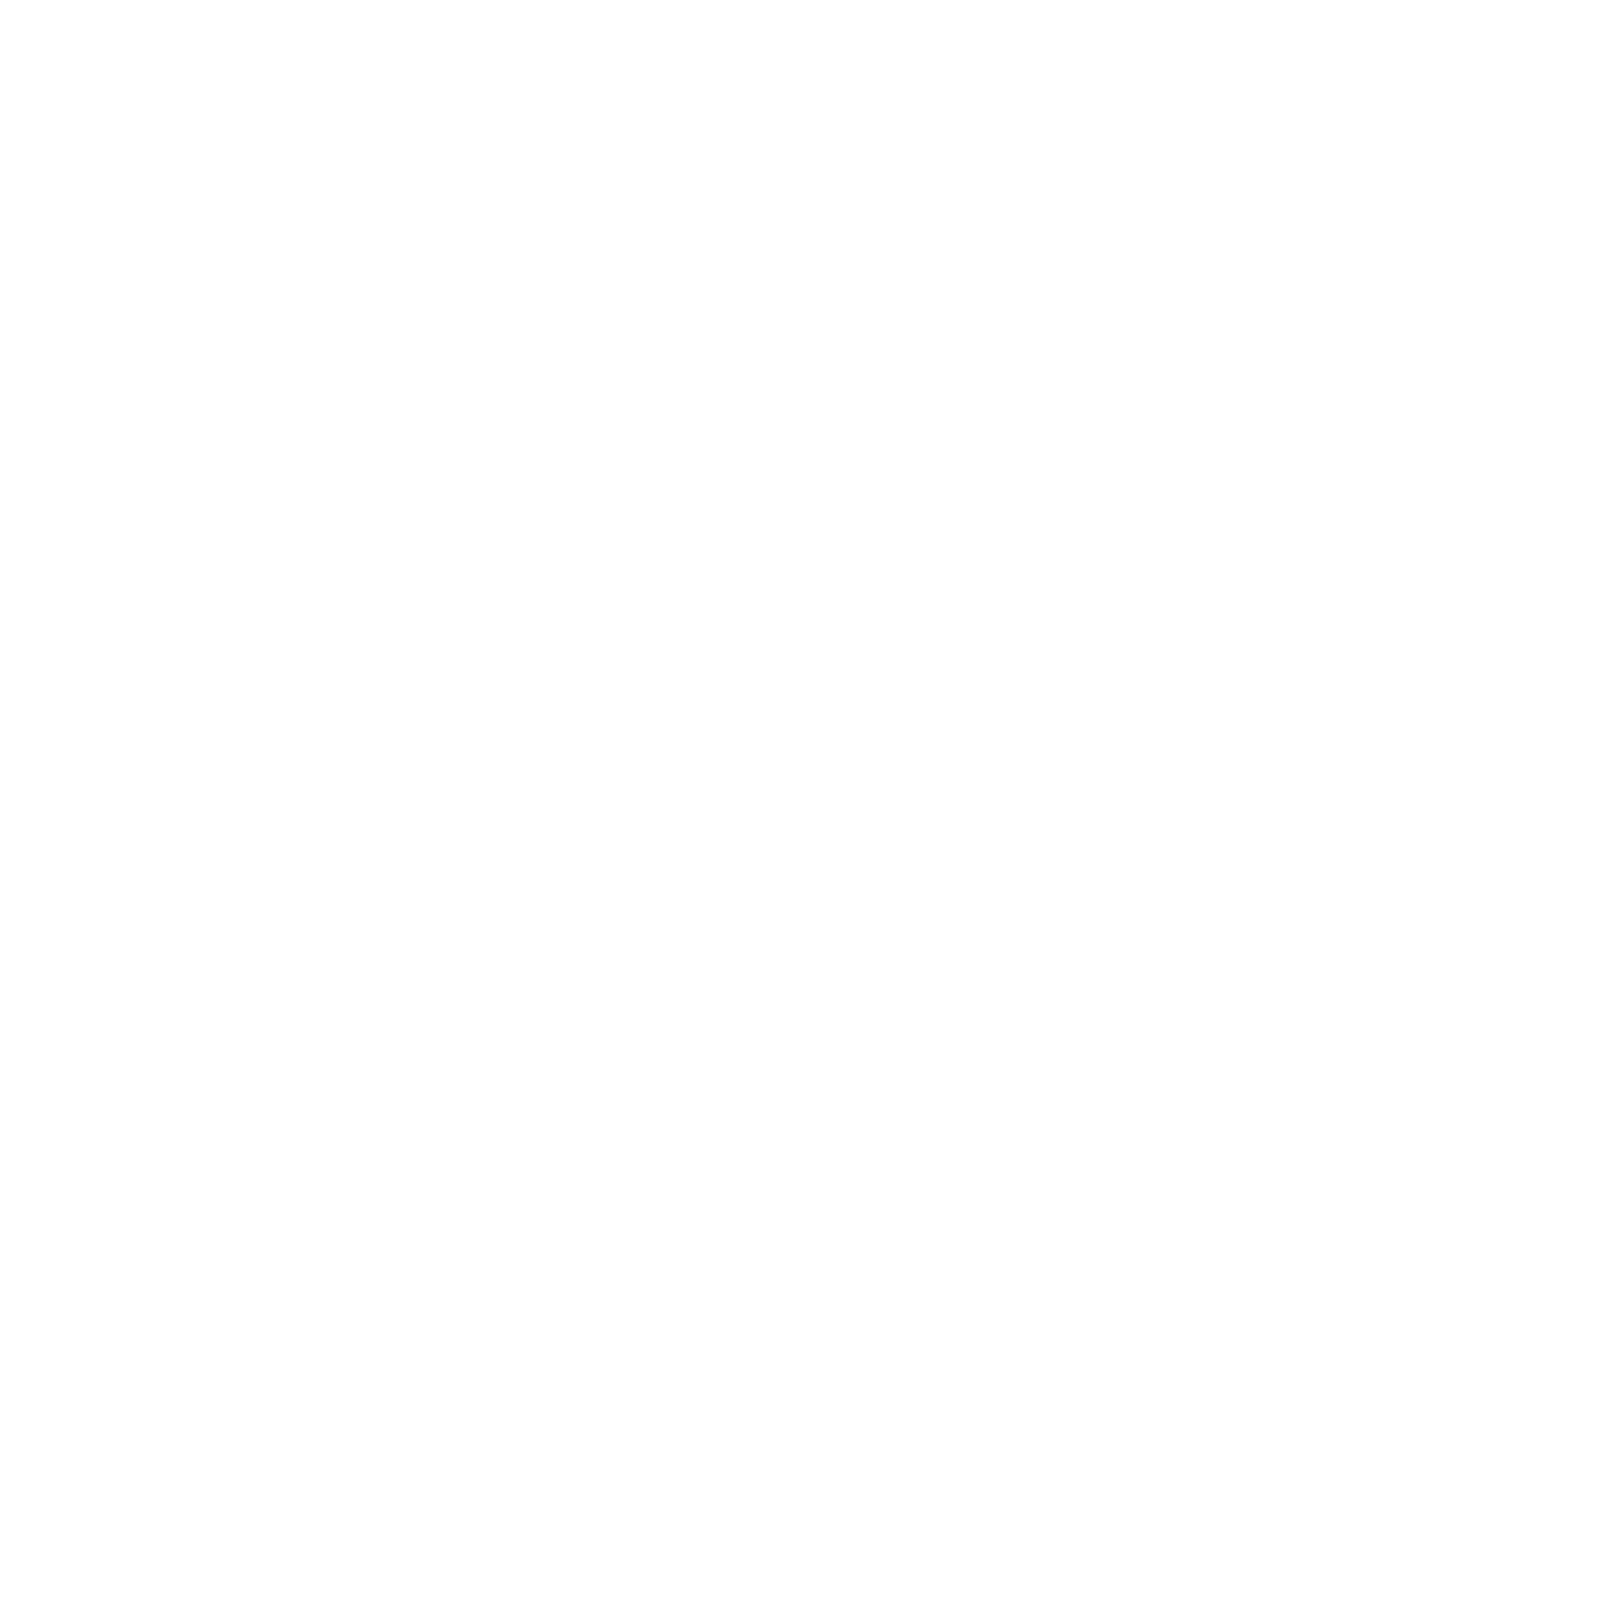 Logo Locanda Cinque Pani e Due Pesci, wireframe bianco